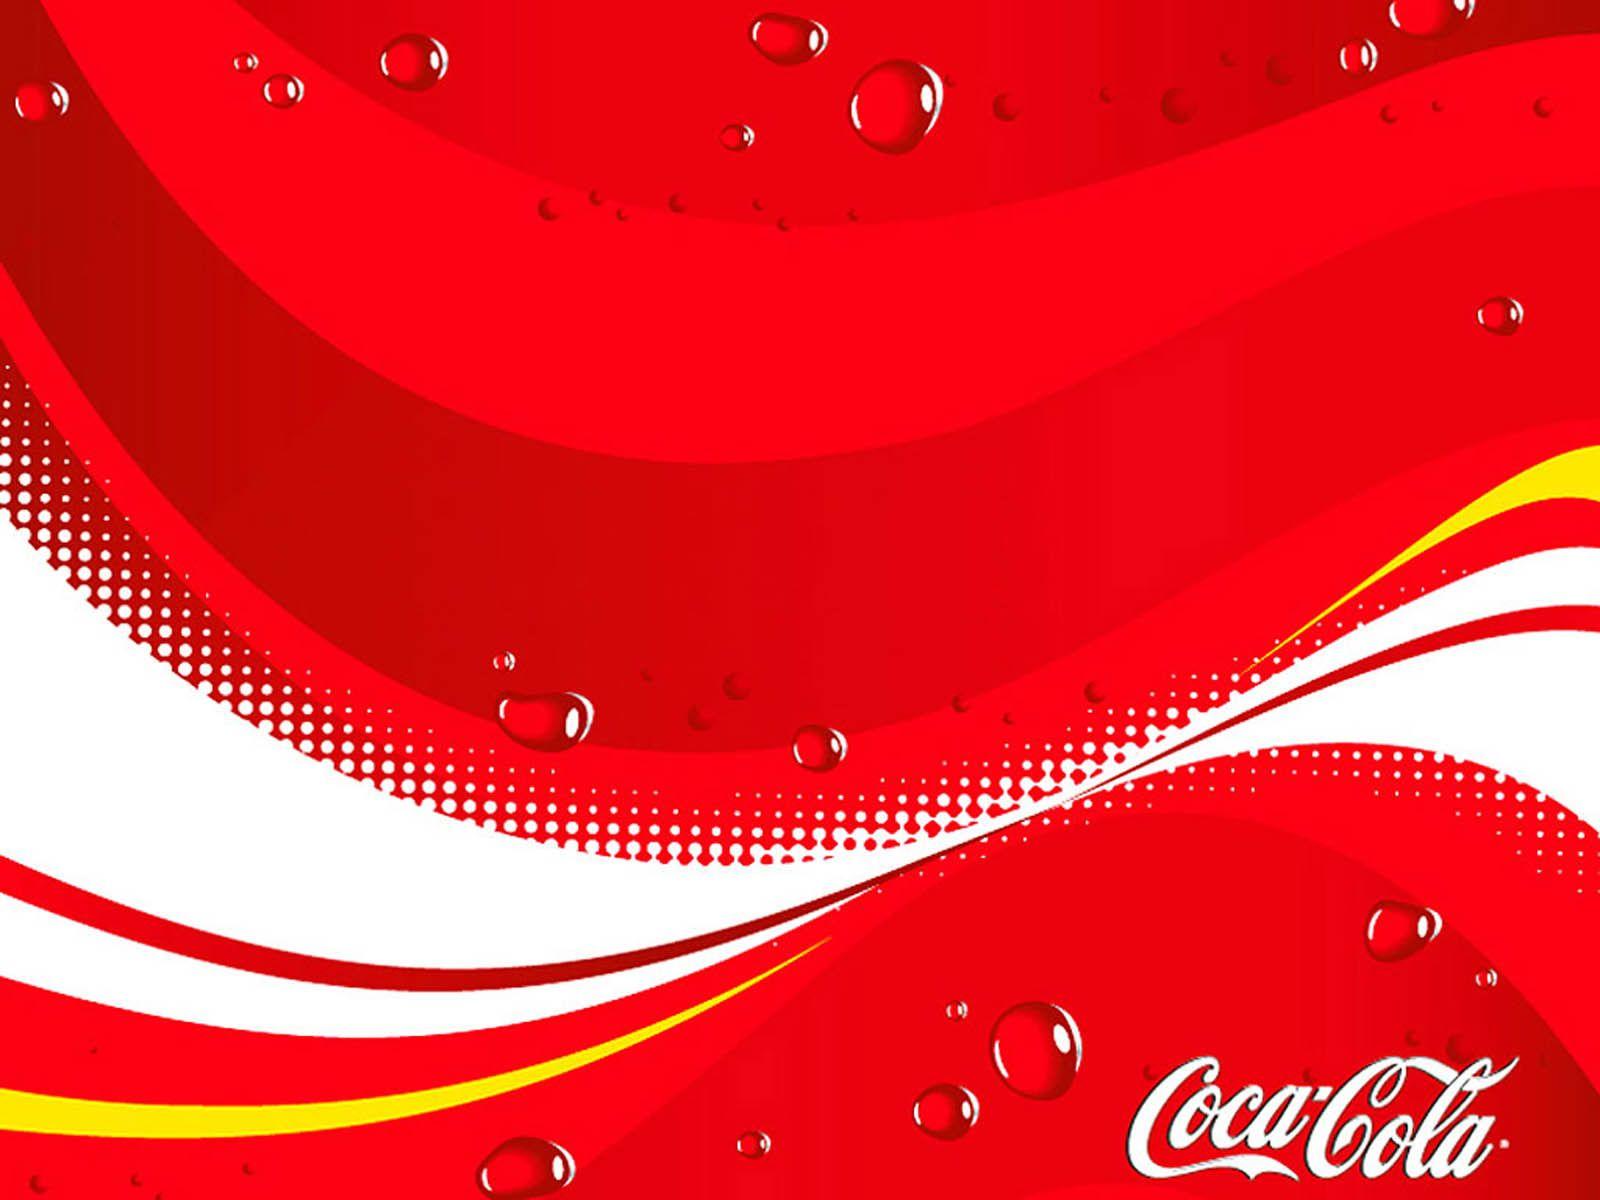 Coca Cola Wallpaper 48 Wallpapers Adorable Wallpapers